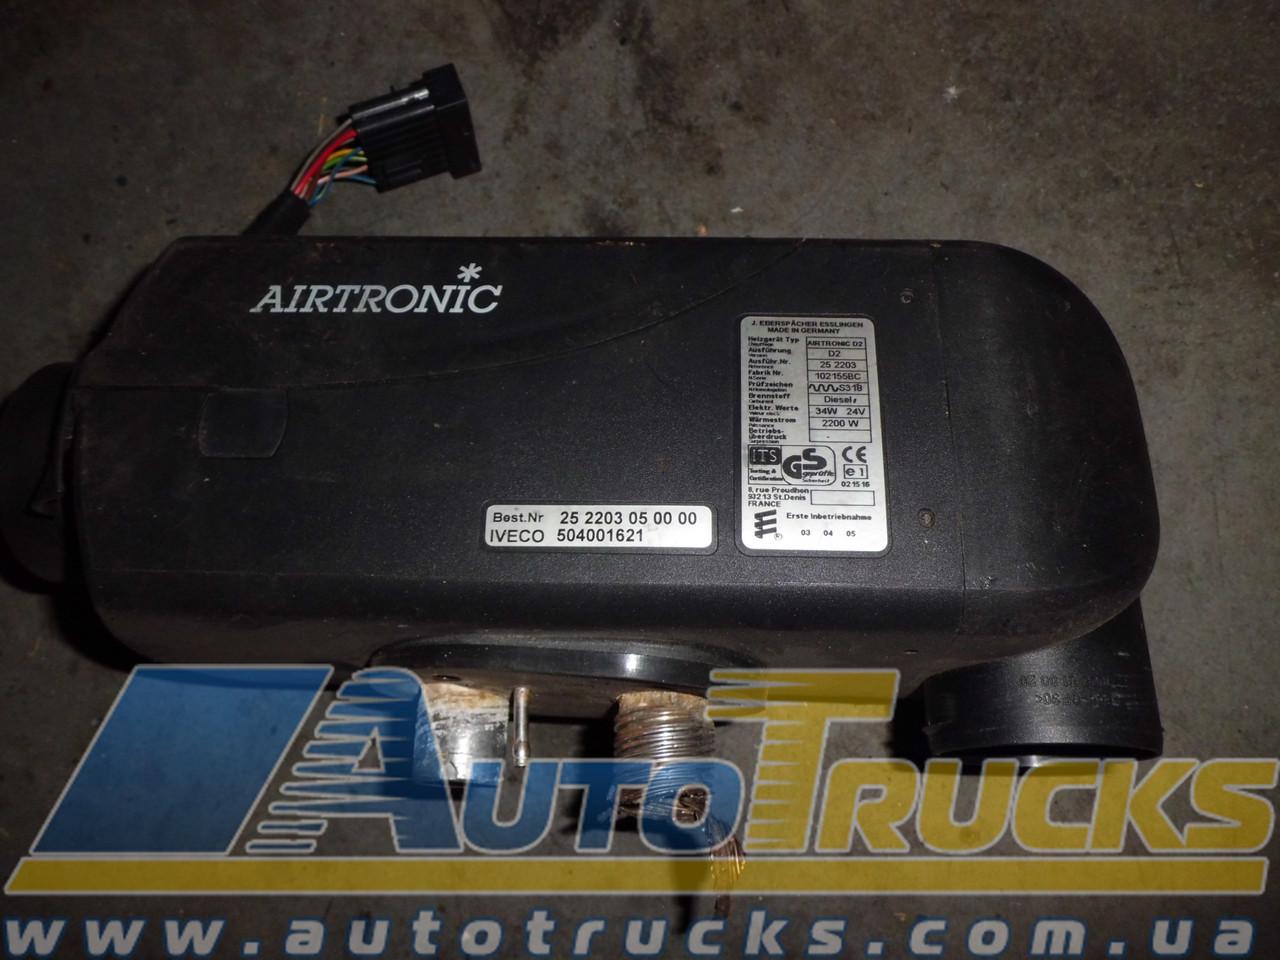 Автономка 24V AIRTRONIC 2.2kw Б/у для IVECO (504001621)